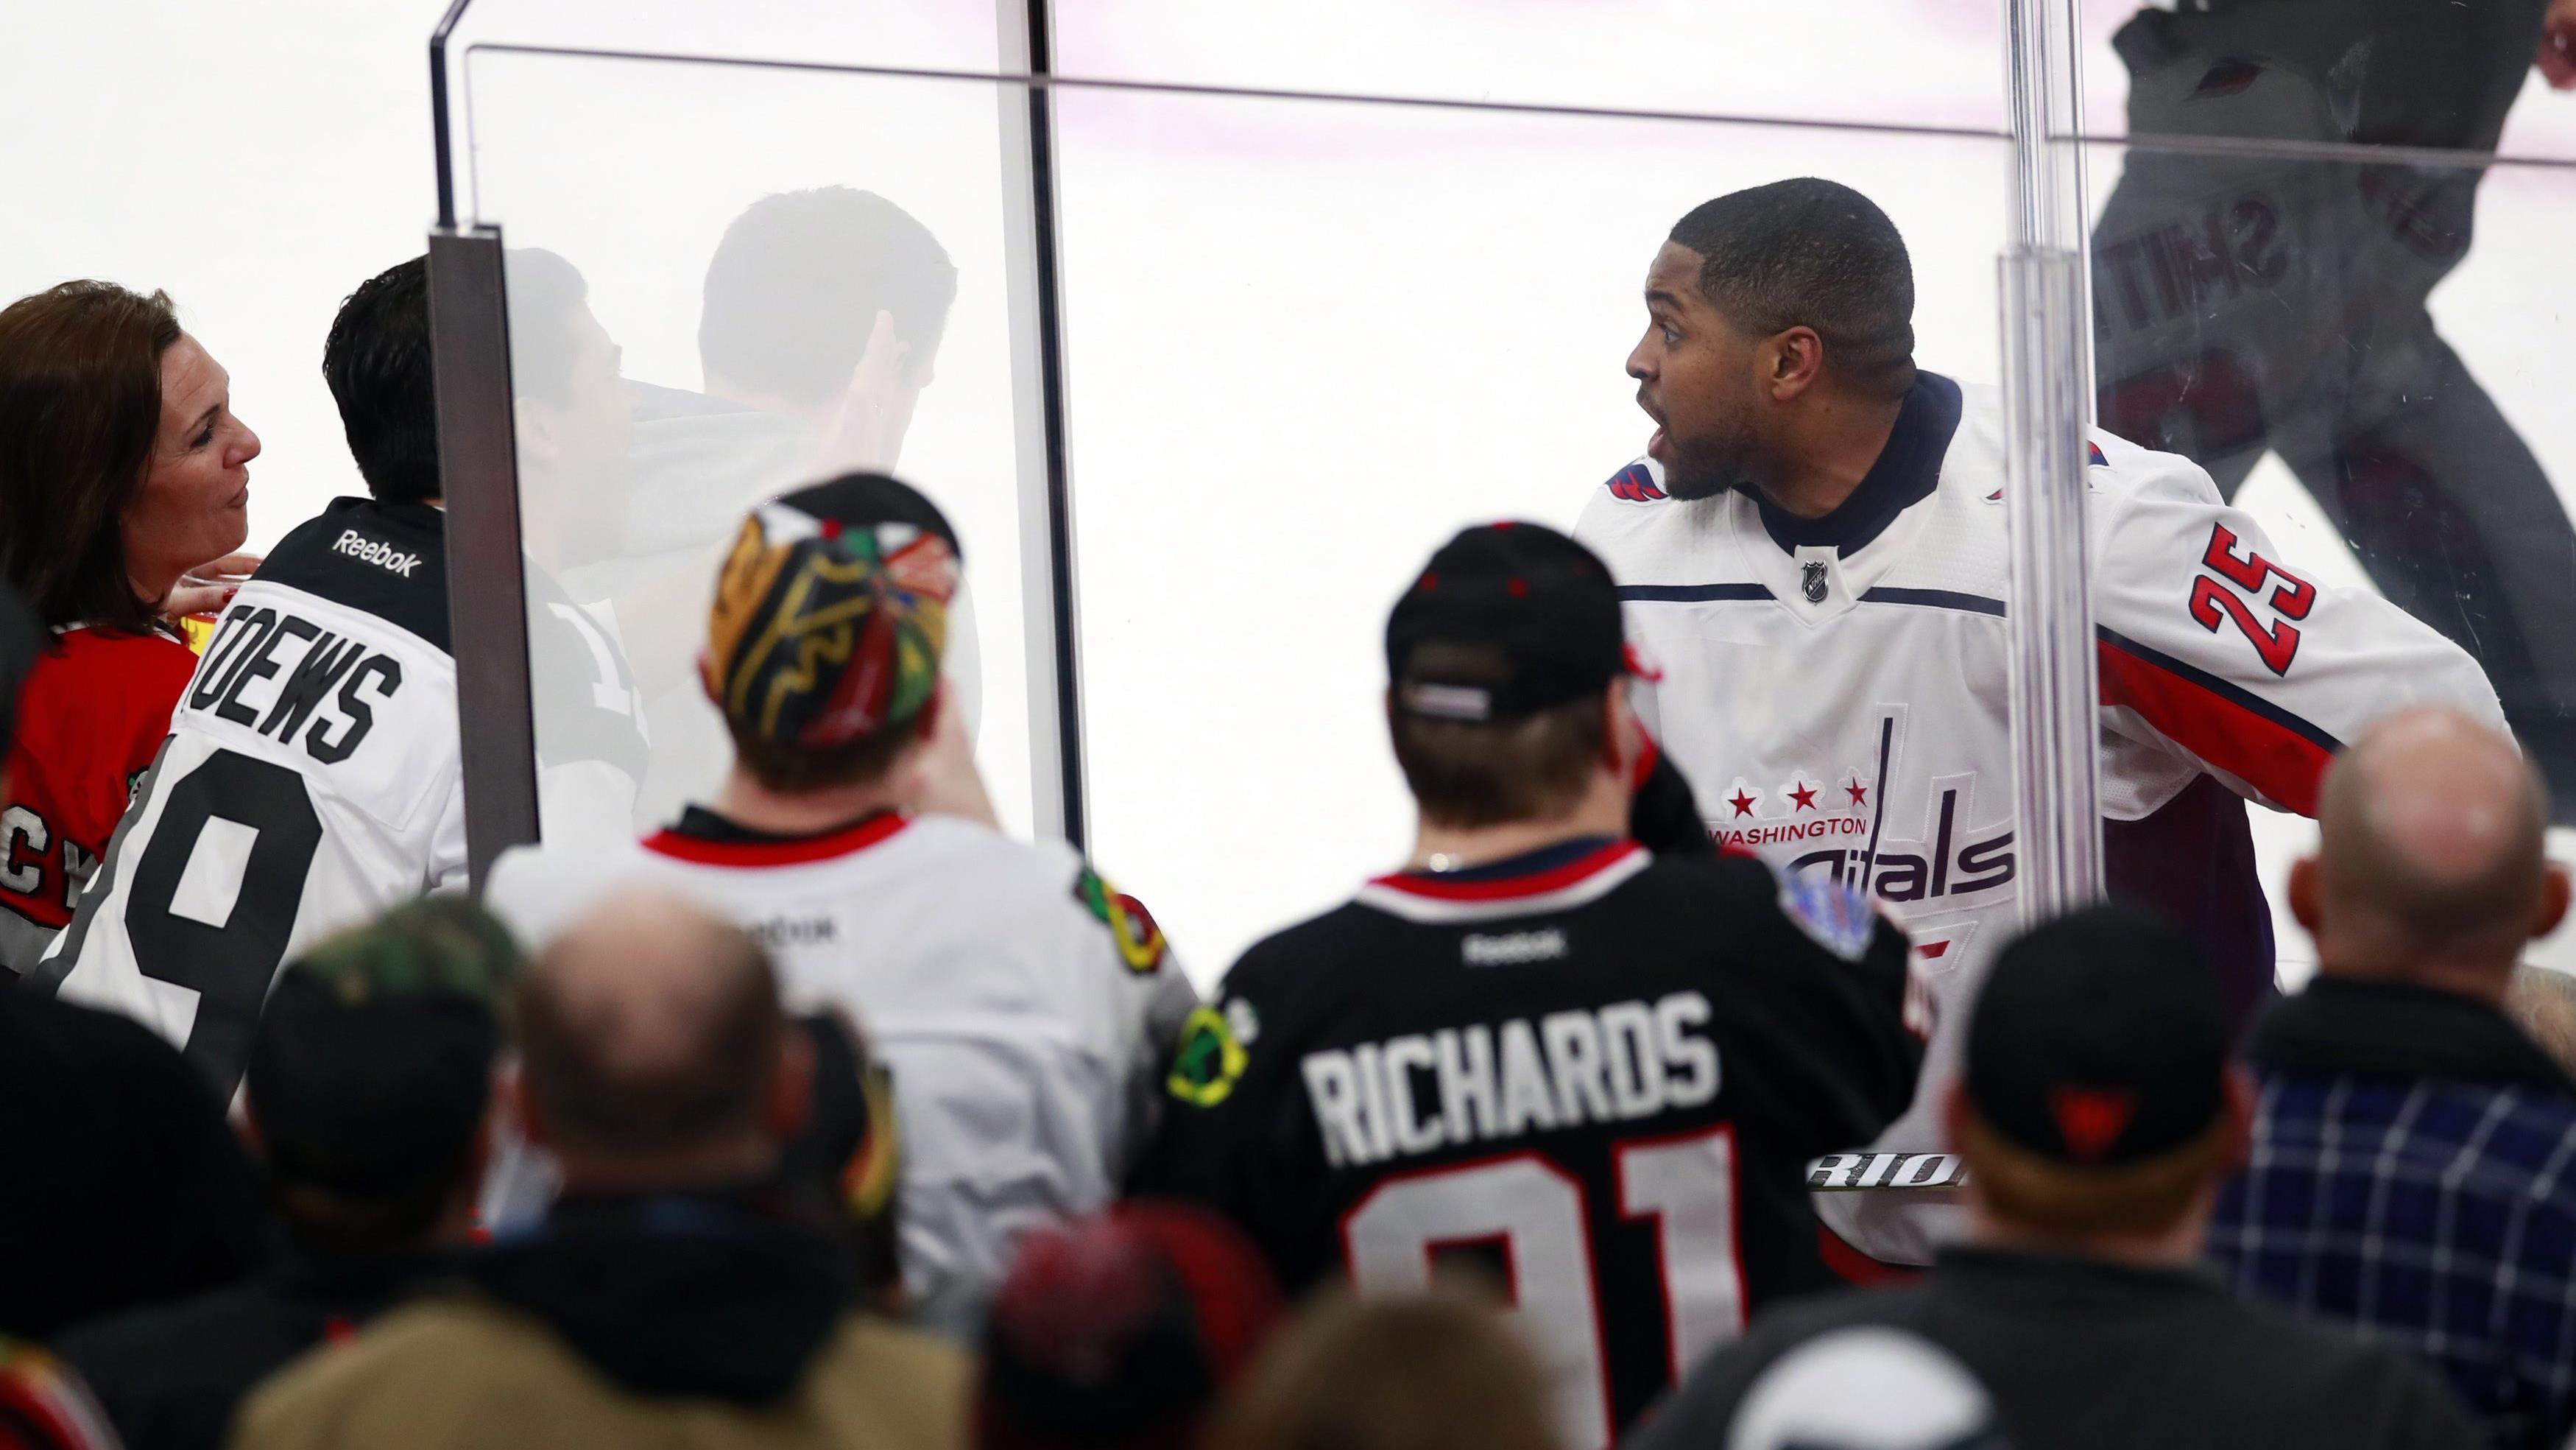 Bettman condamne l'incident raciste survenu à Chicago